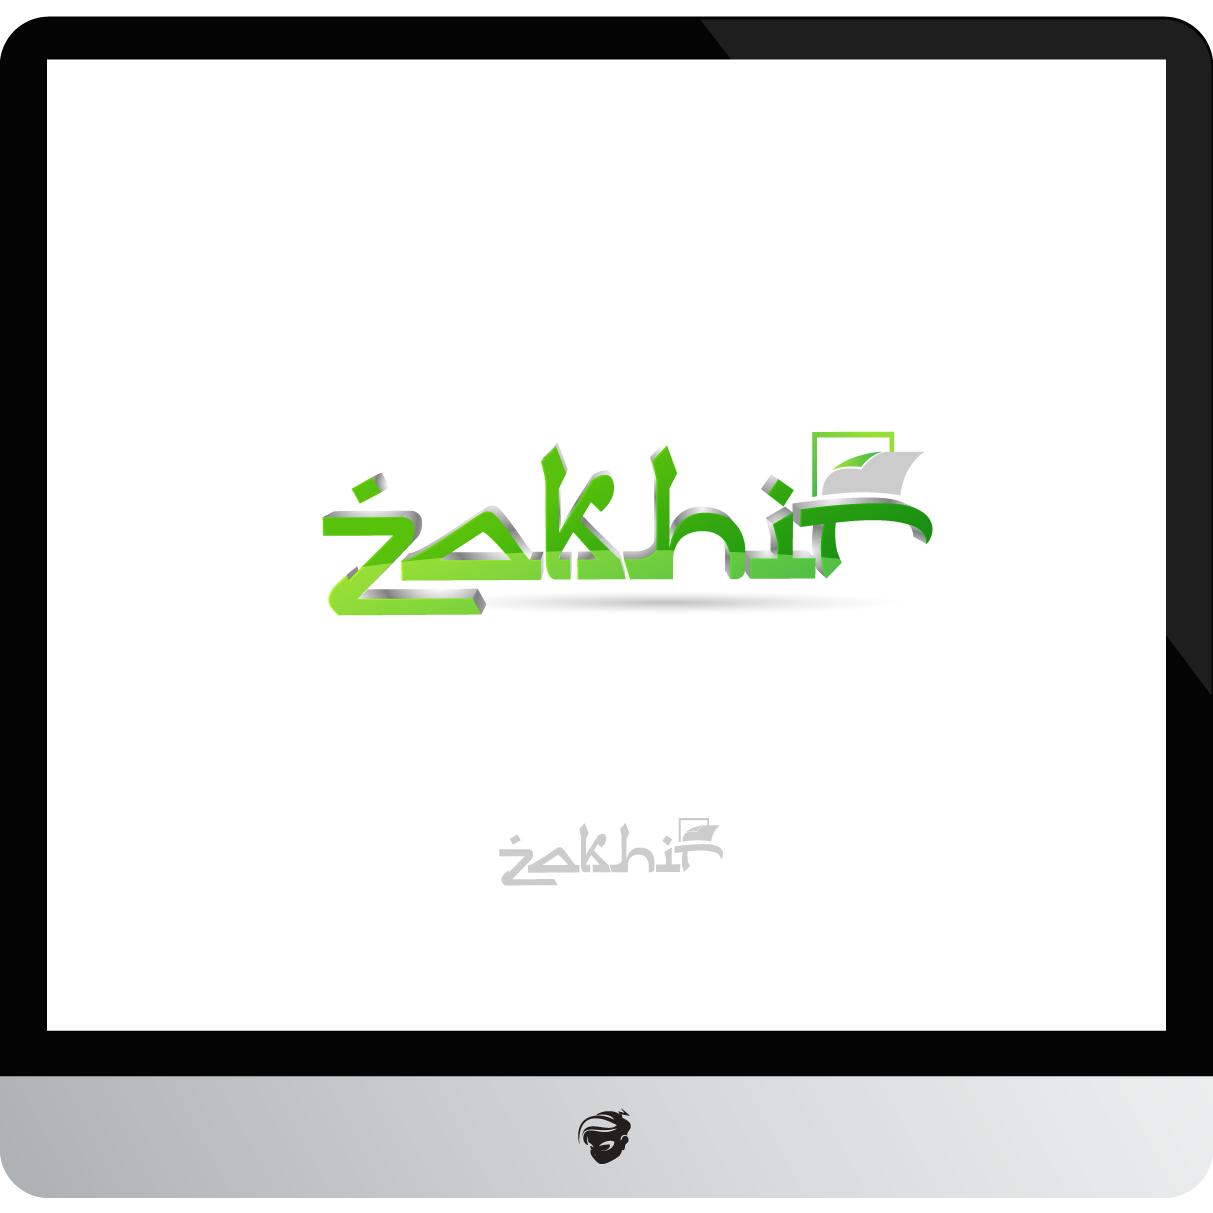 Logo Design by zesthar - Entry No. 61 in the Logo Design Contest Zakhir Logo Design.